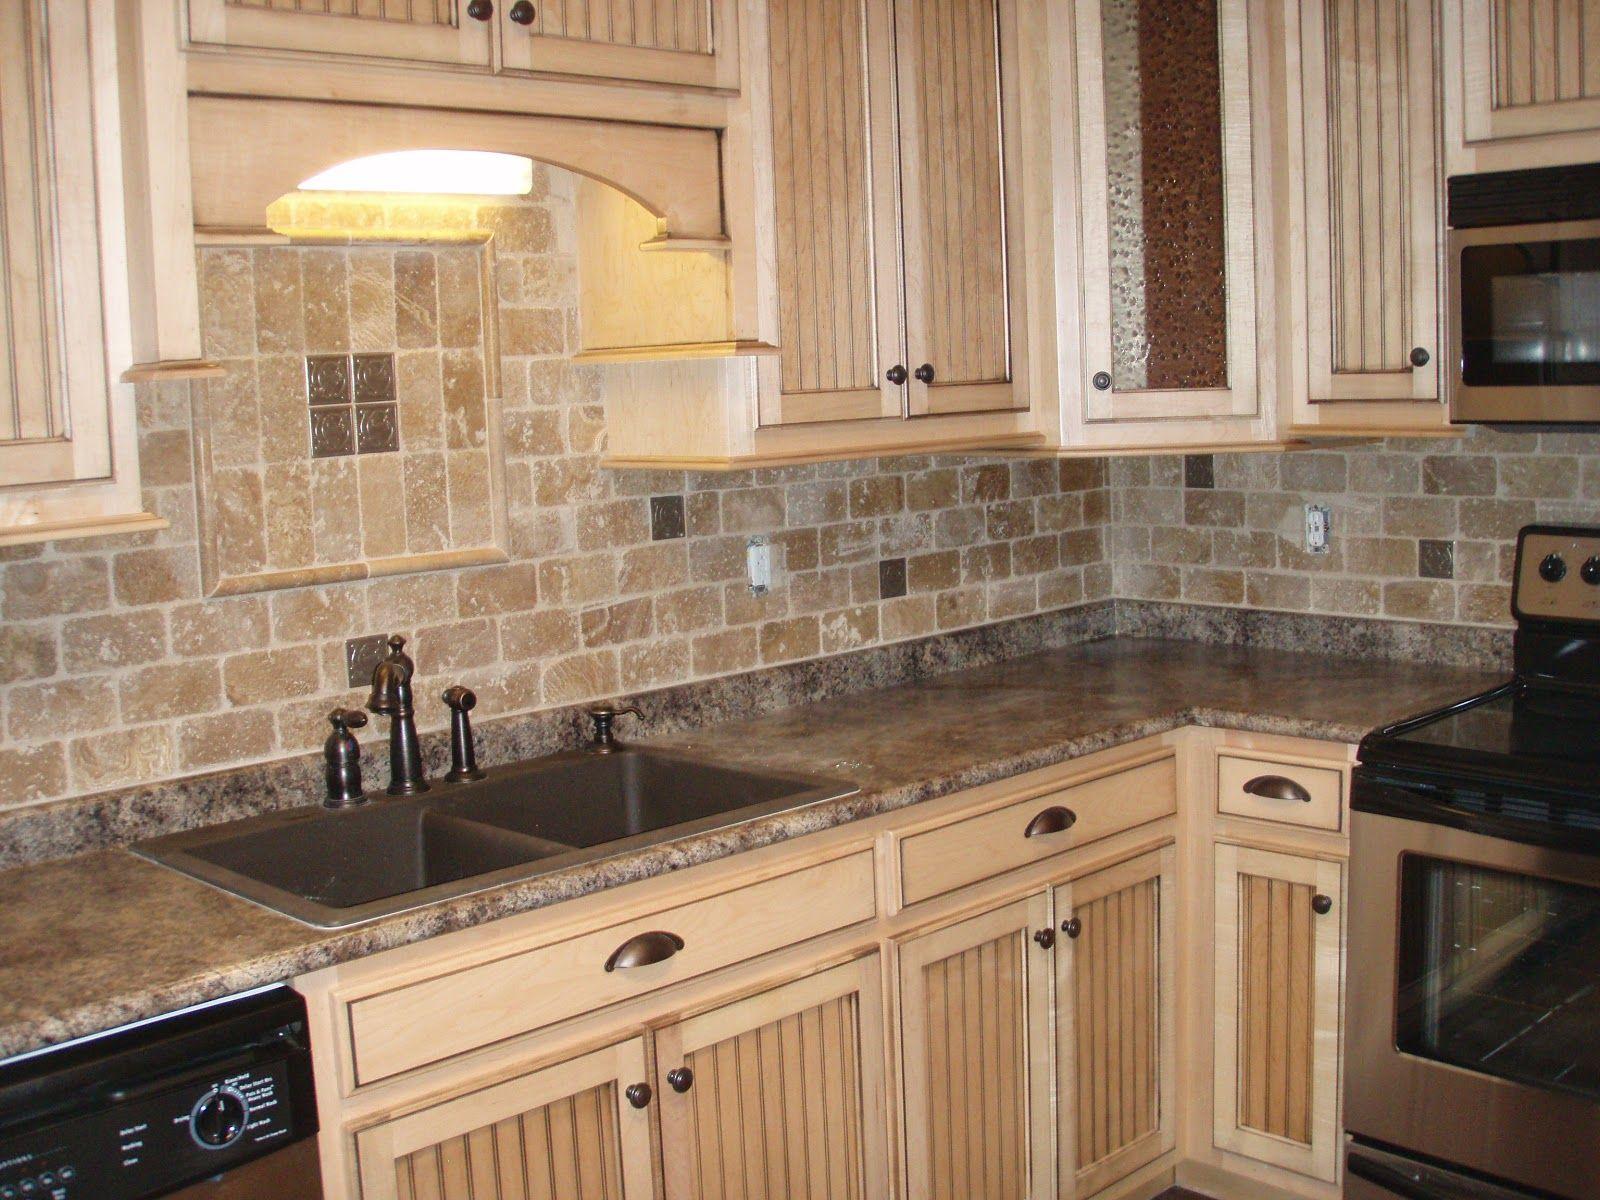 Stone Kitchen Backsplash With White Cabinets  backsplash